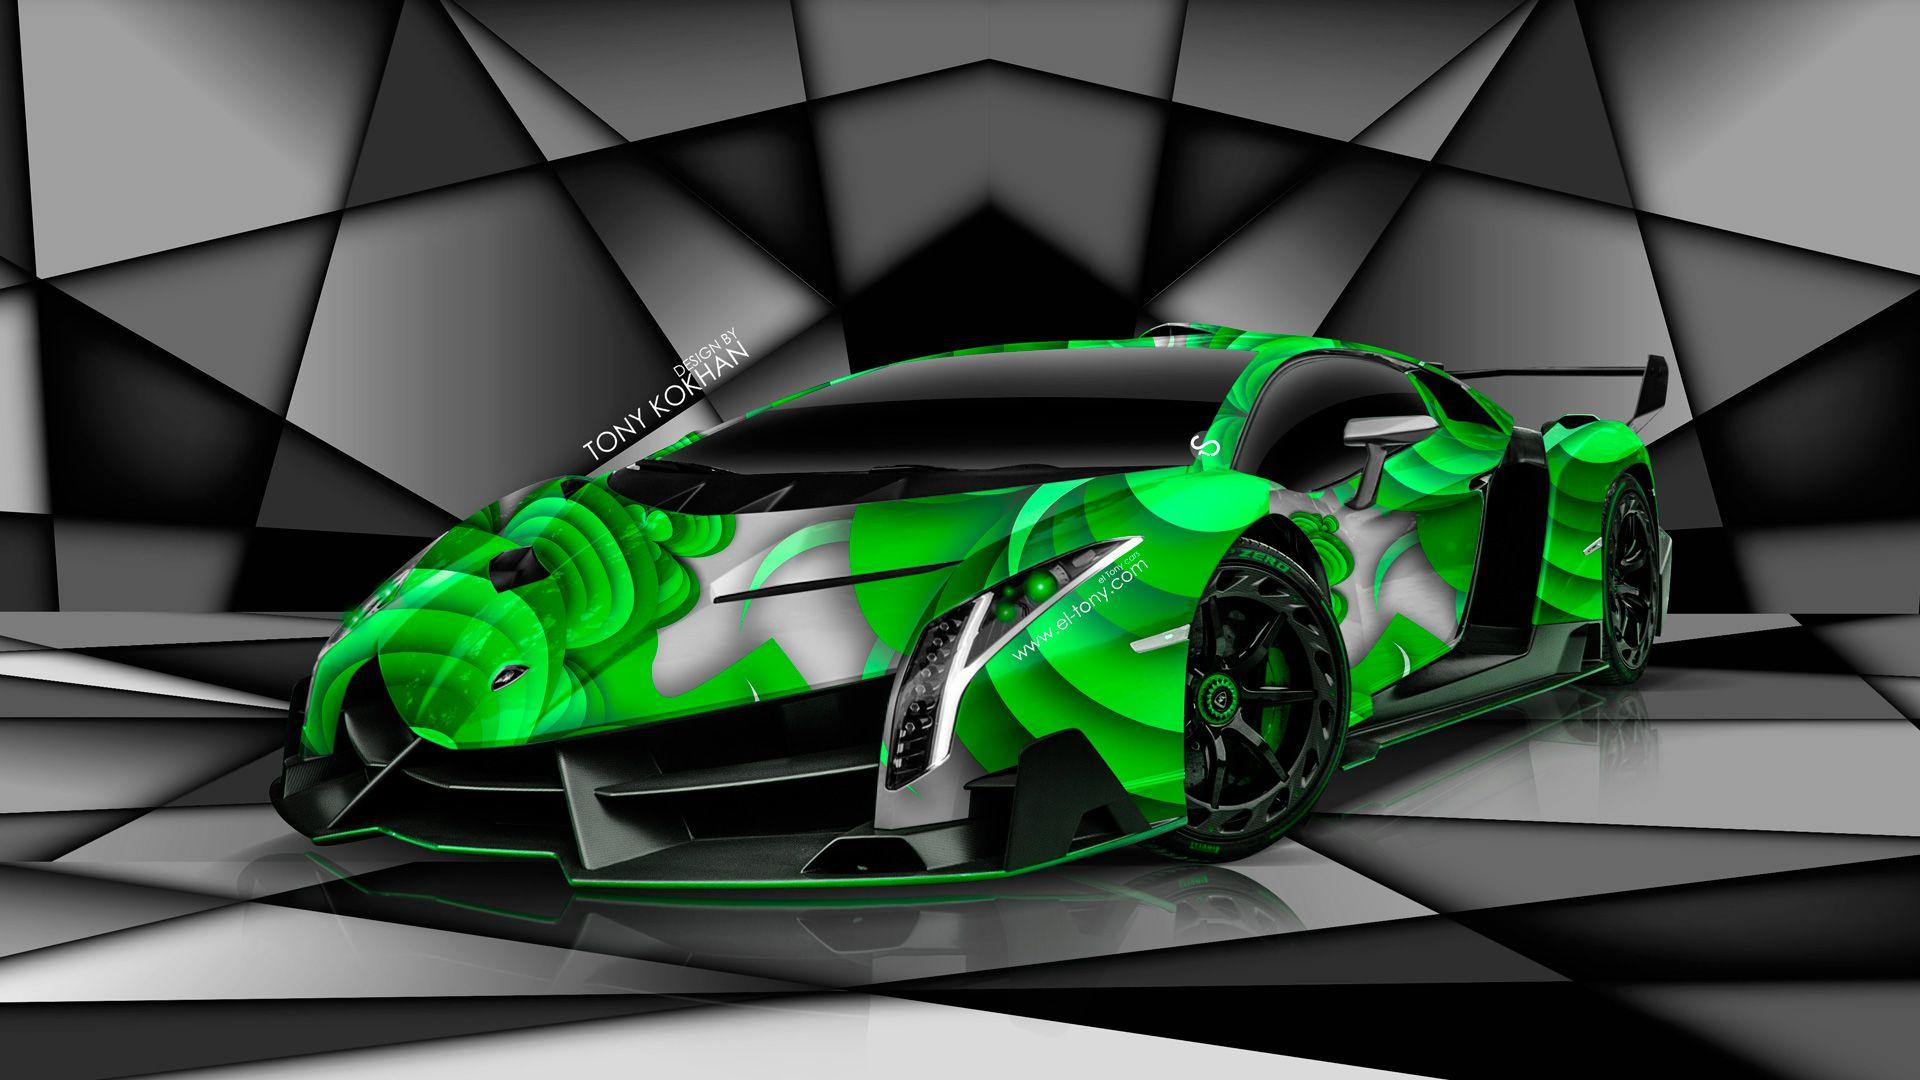 2015 Veneno Cool Car Wallpaper http